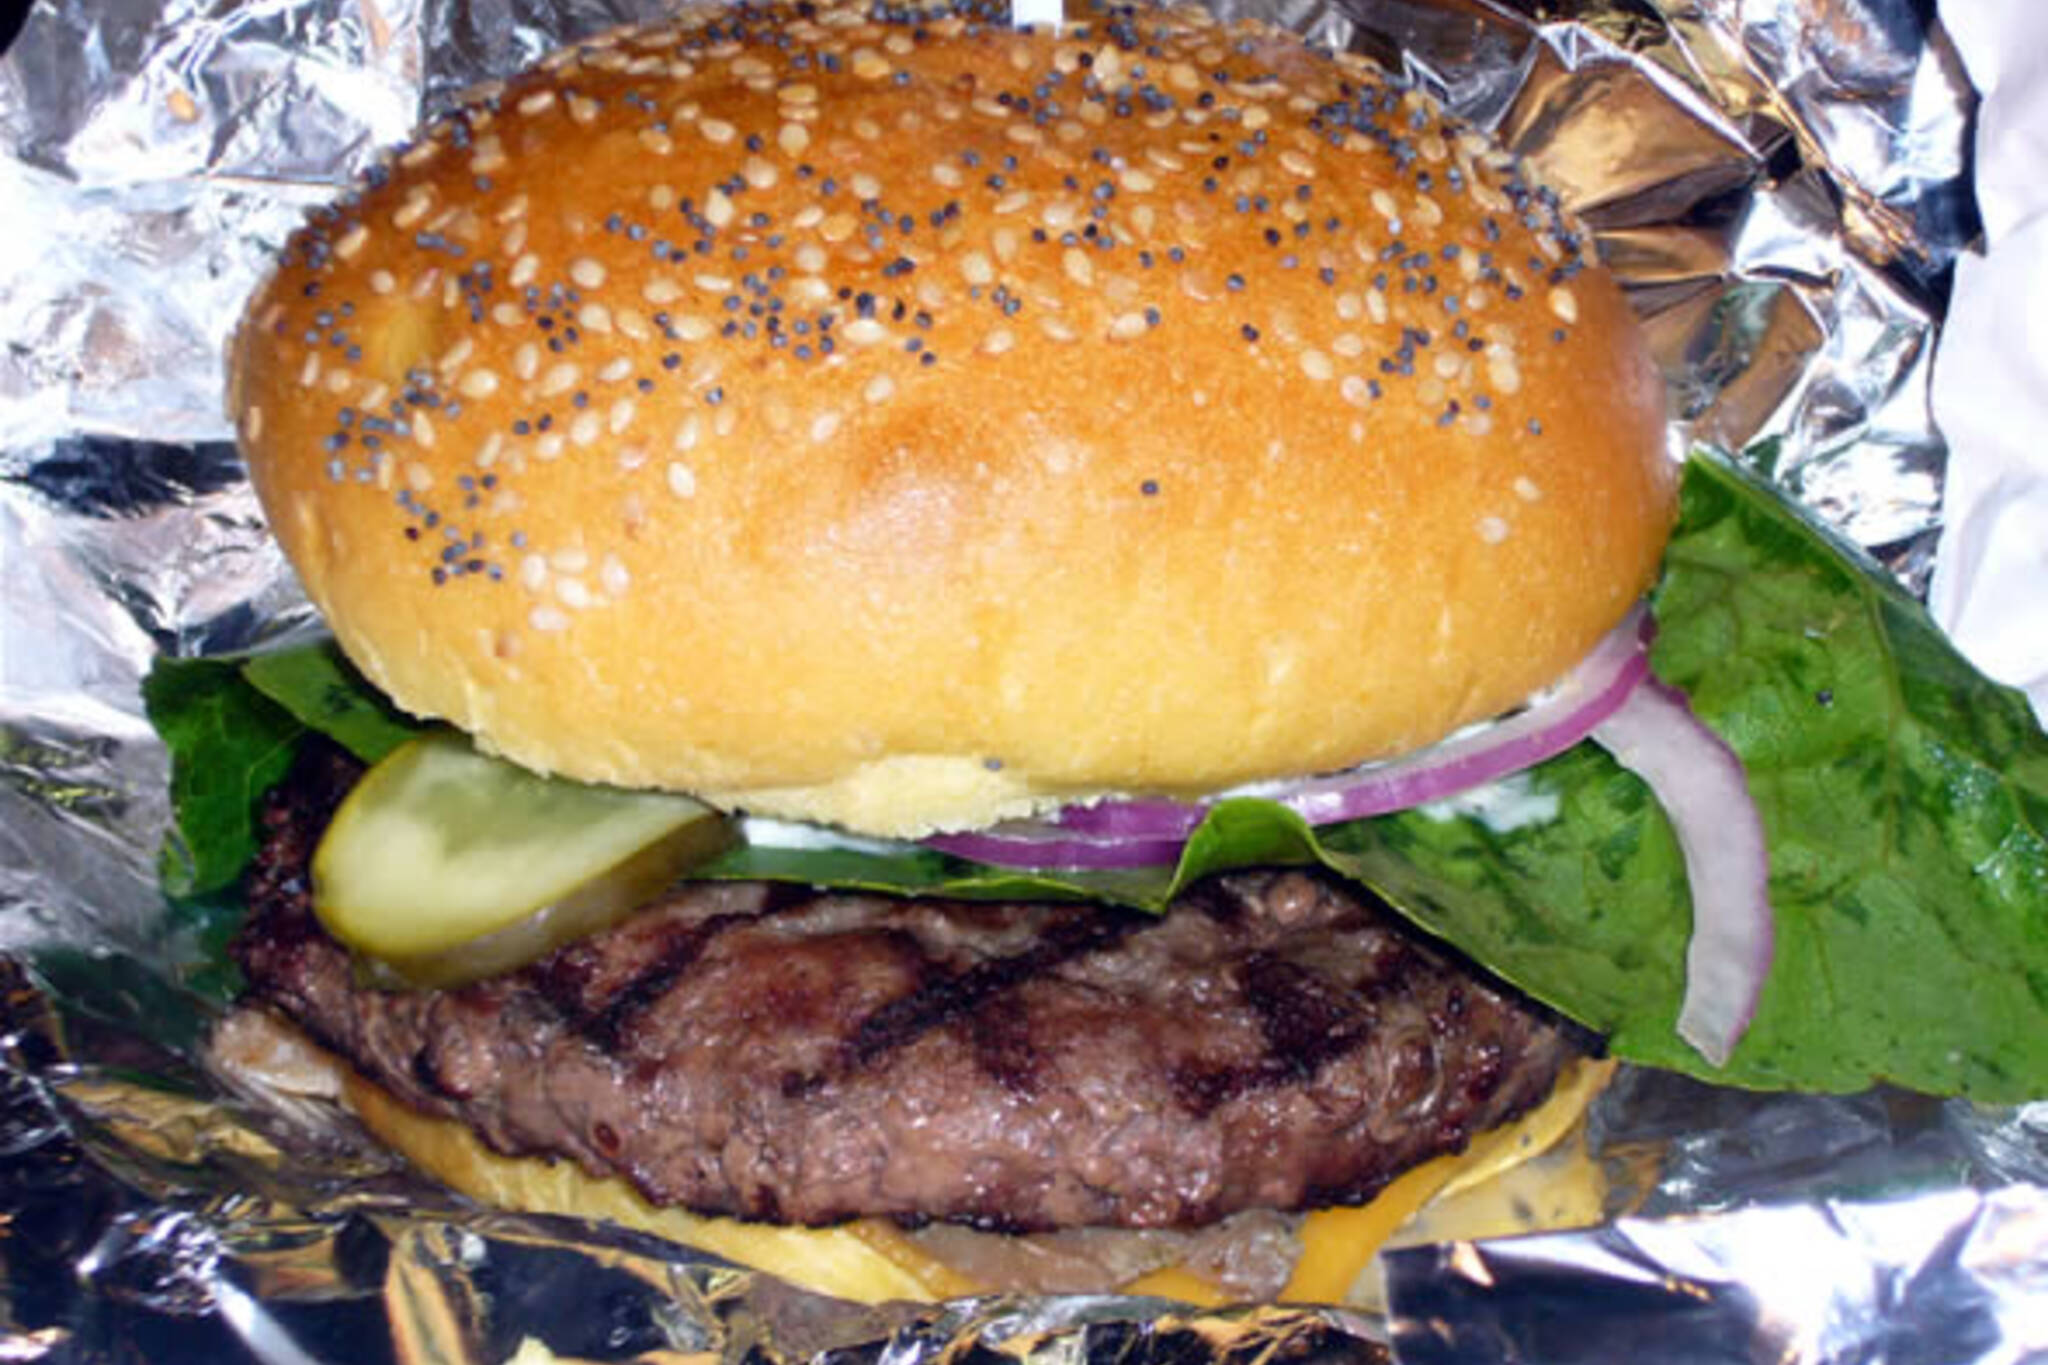 mmm...beefy: 100% angus acme burger